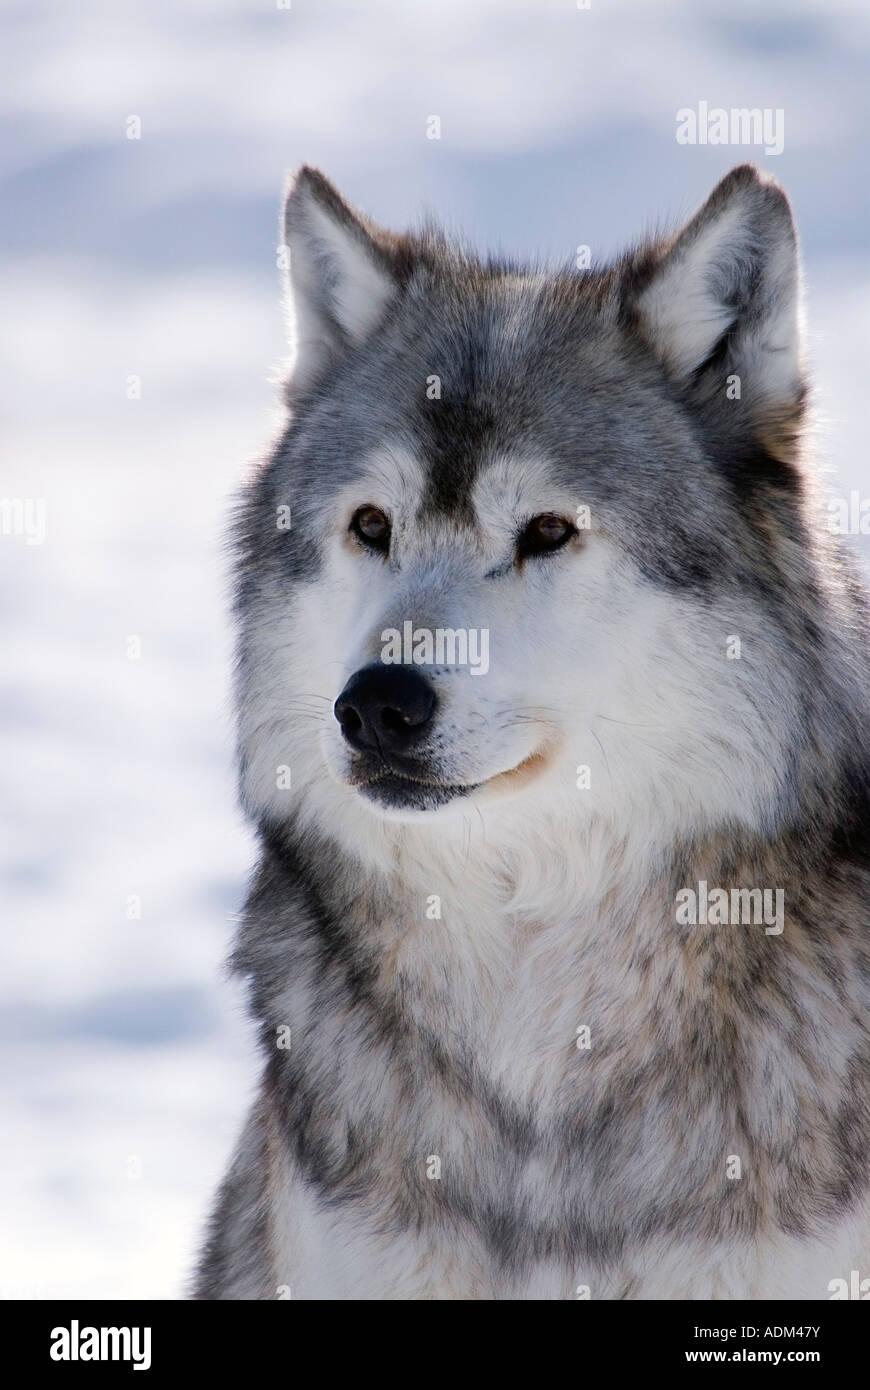 Captive Gray Wolf winter portrait - Stock Image